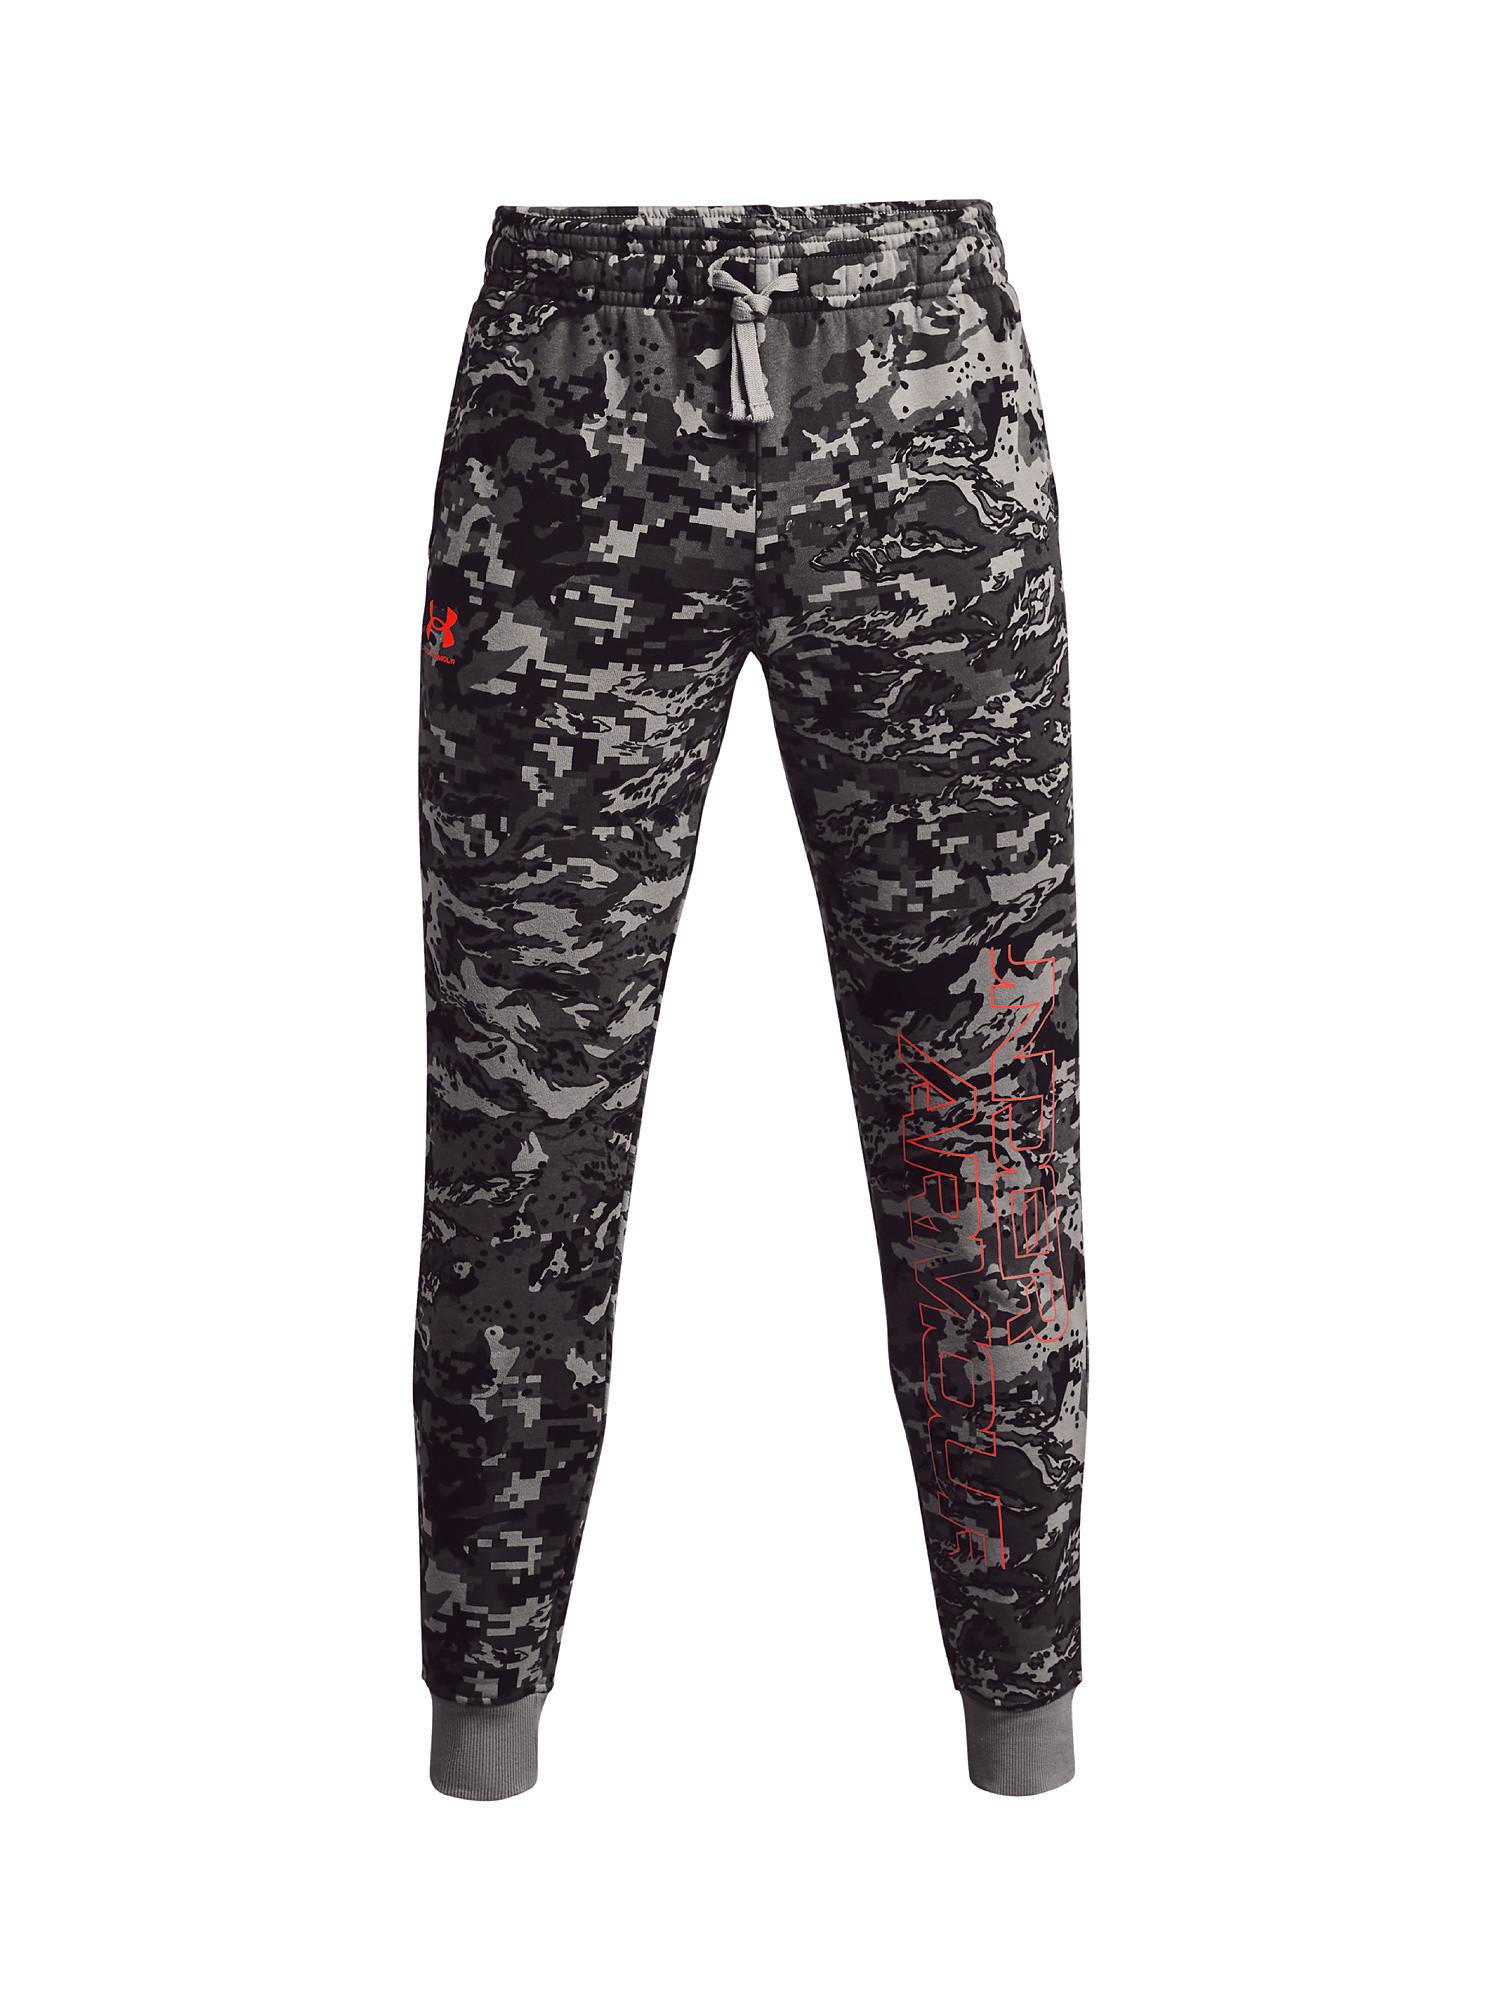 Pantaloni sportivi, Marrone, large image number 0